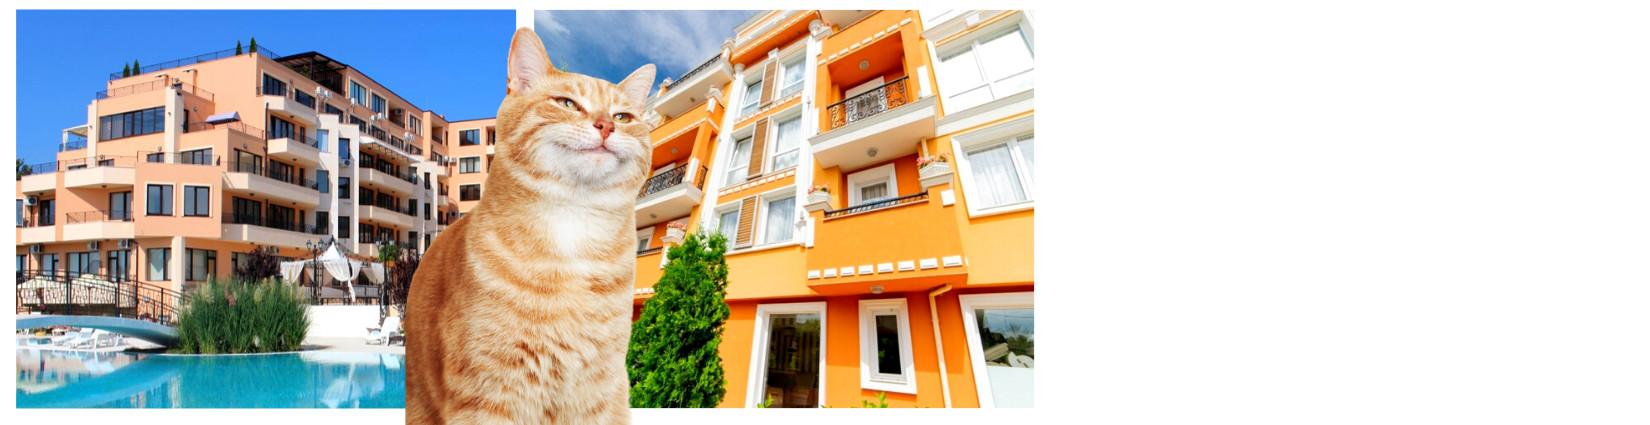 Апартаменты без таксы поддержки<br> на море от 21 000 евро